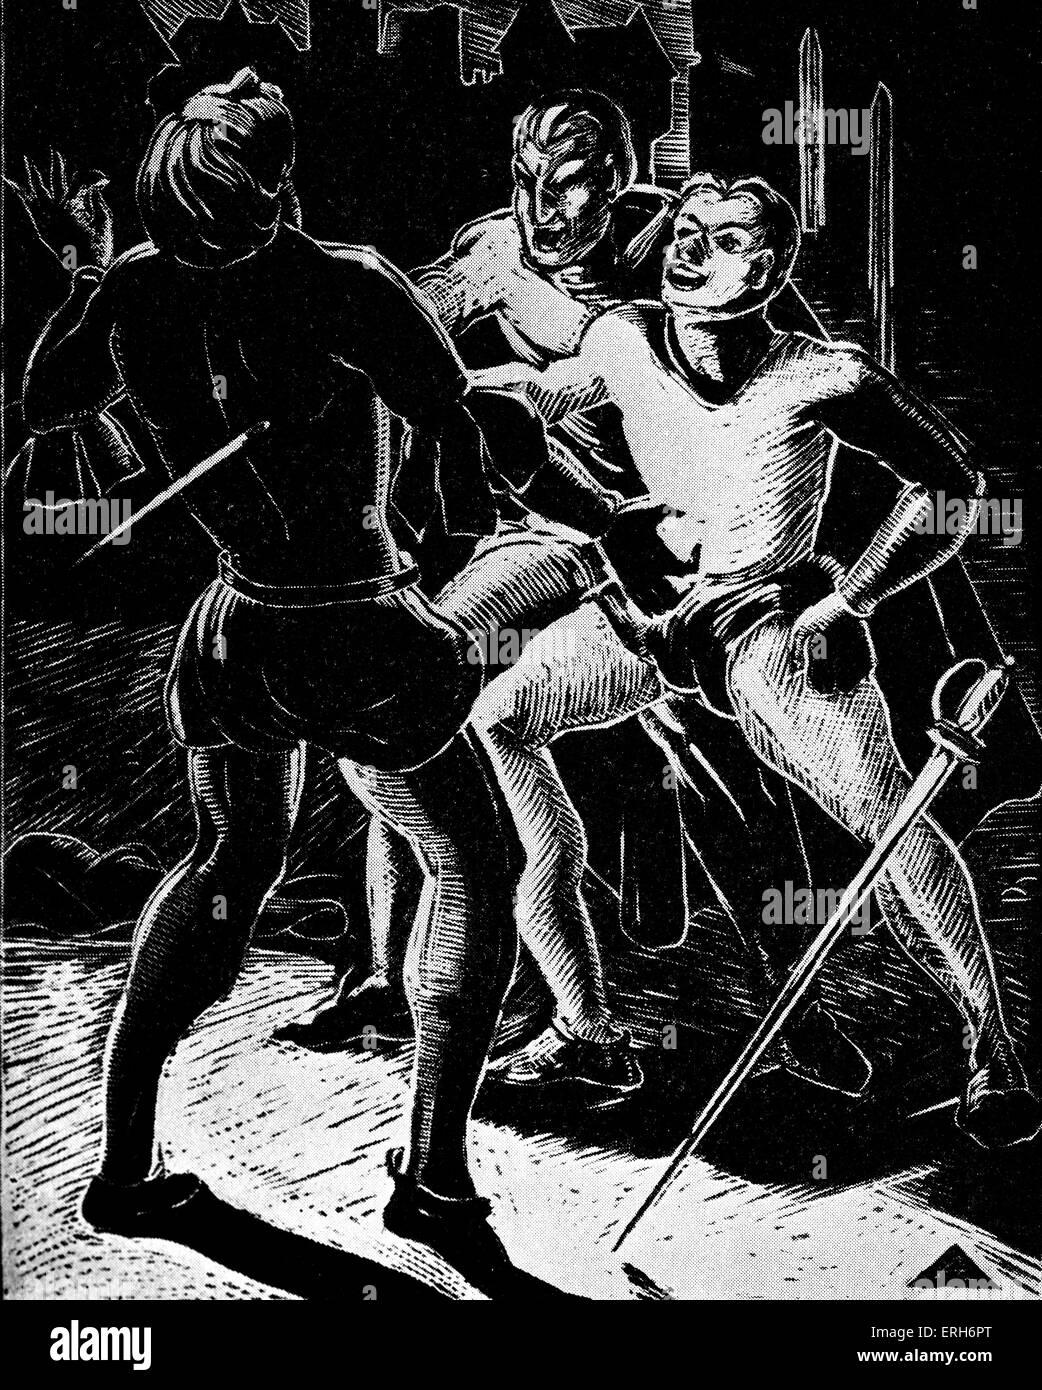 Faust: The Duel. Woodcut by Nan Leeder. JWG: German poet, novelist, dramatist, and philosopher.  August 28th 1749 - Stock Image